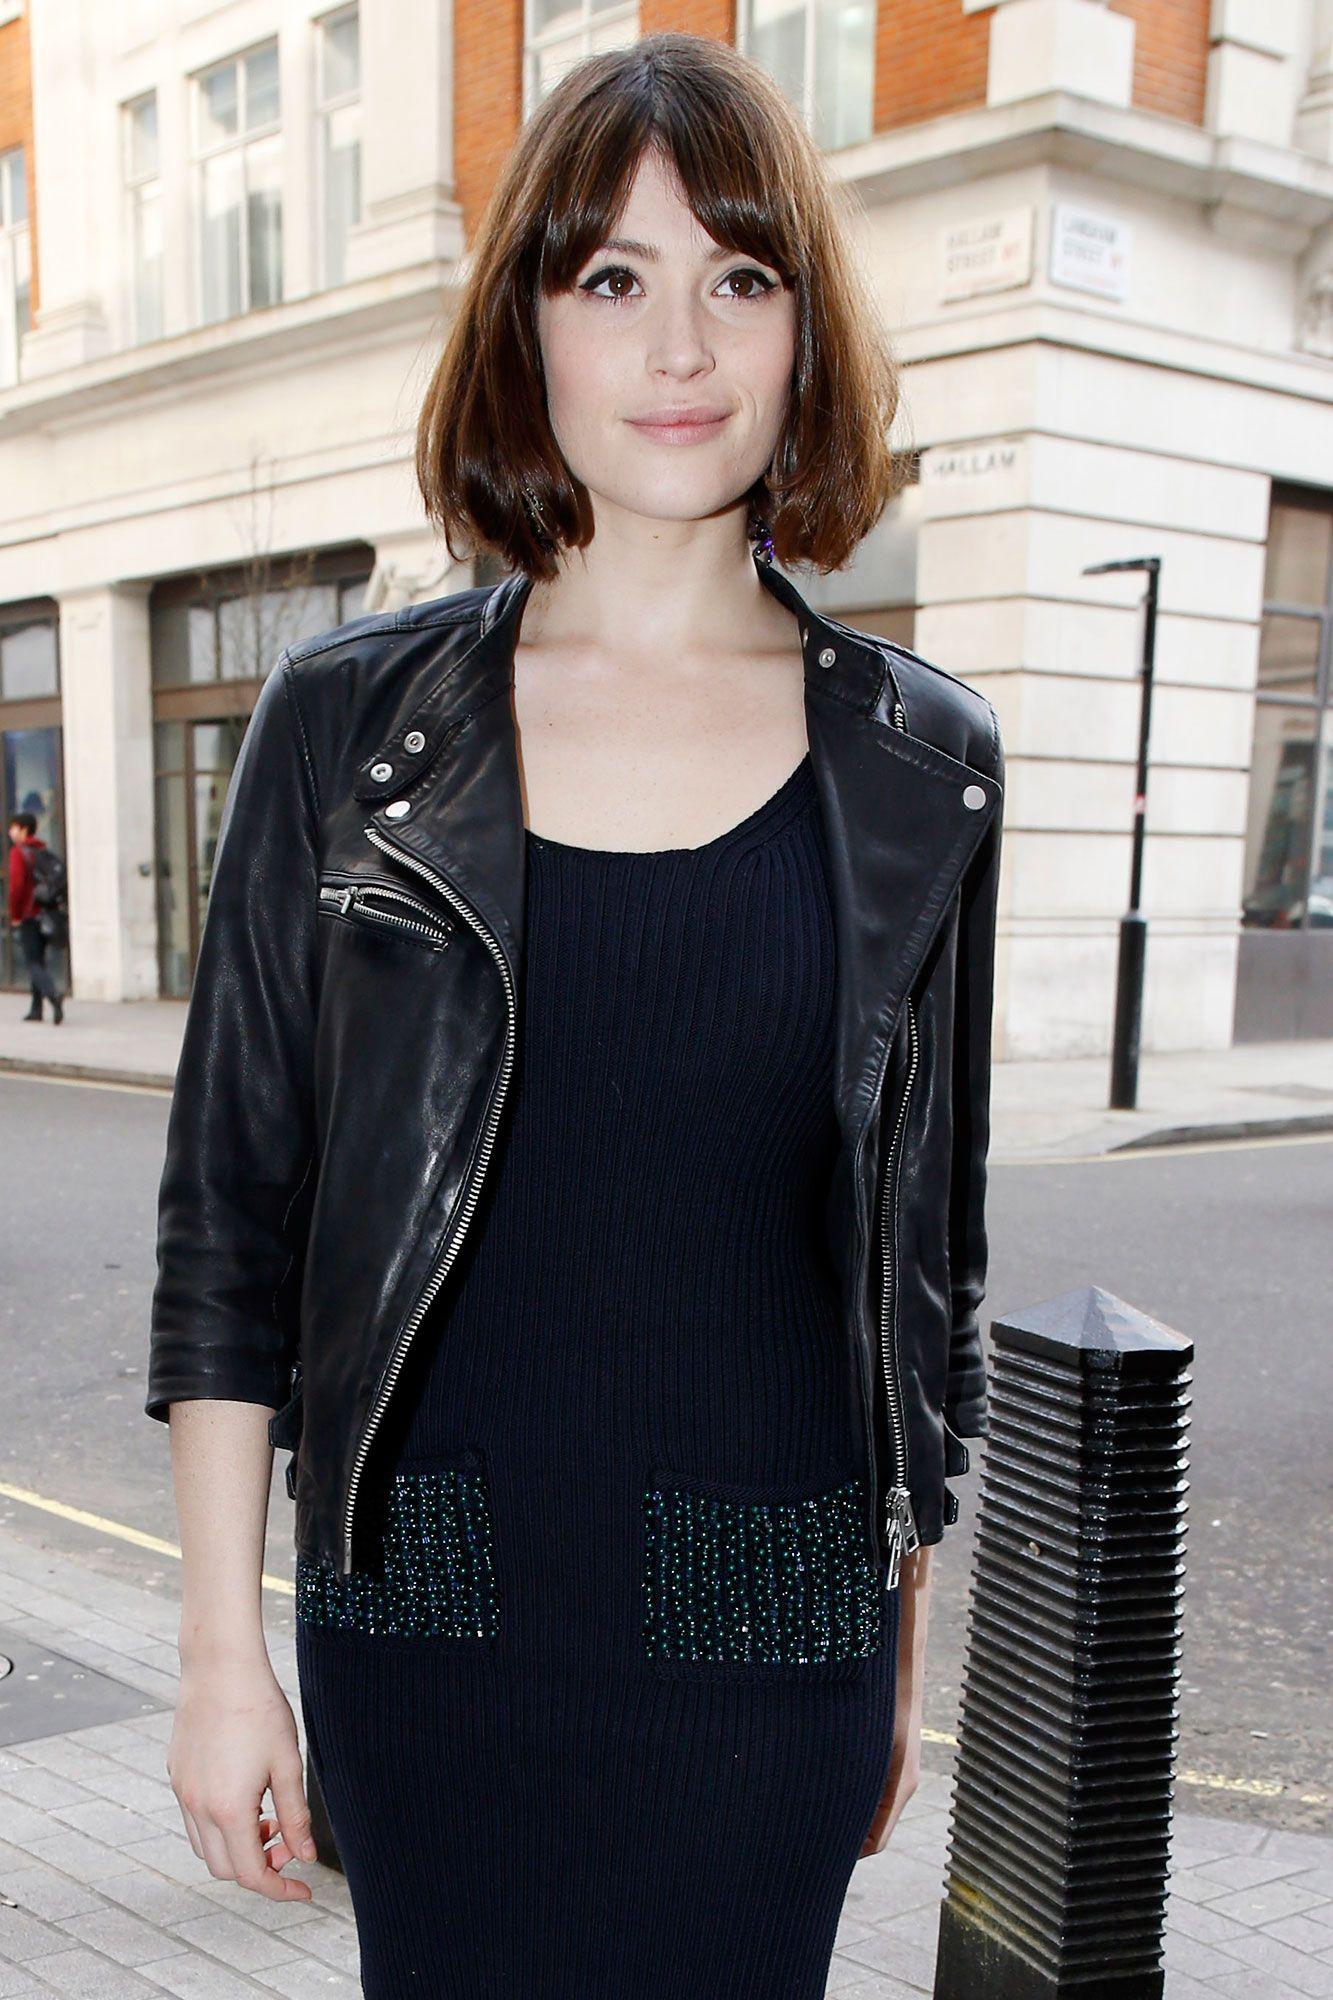 Gemma Arterton - Photo: Getty Images